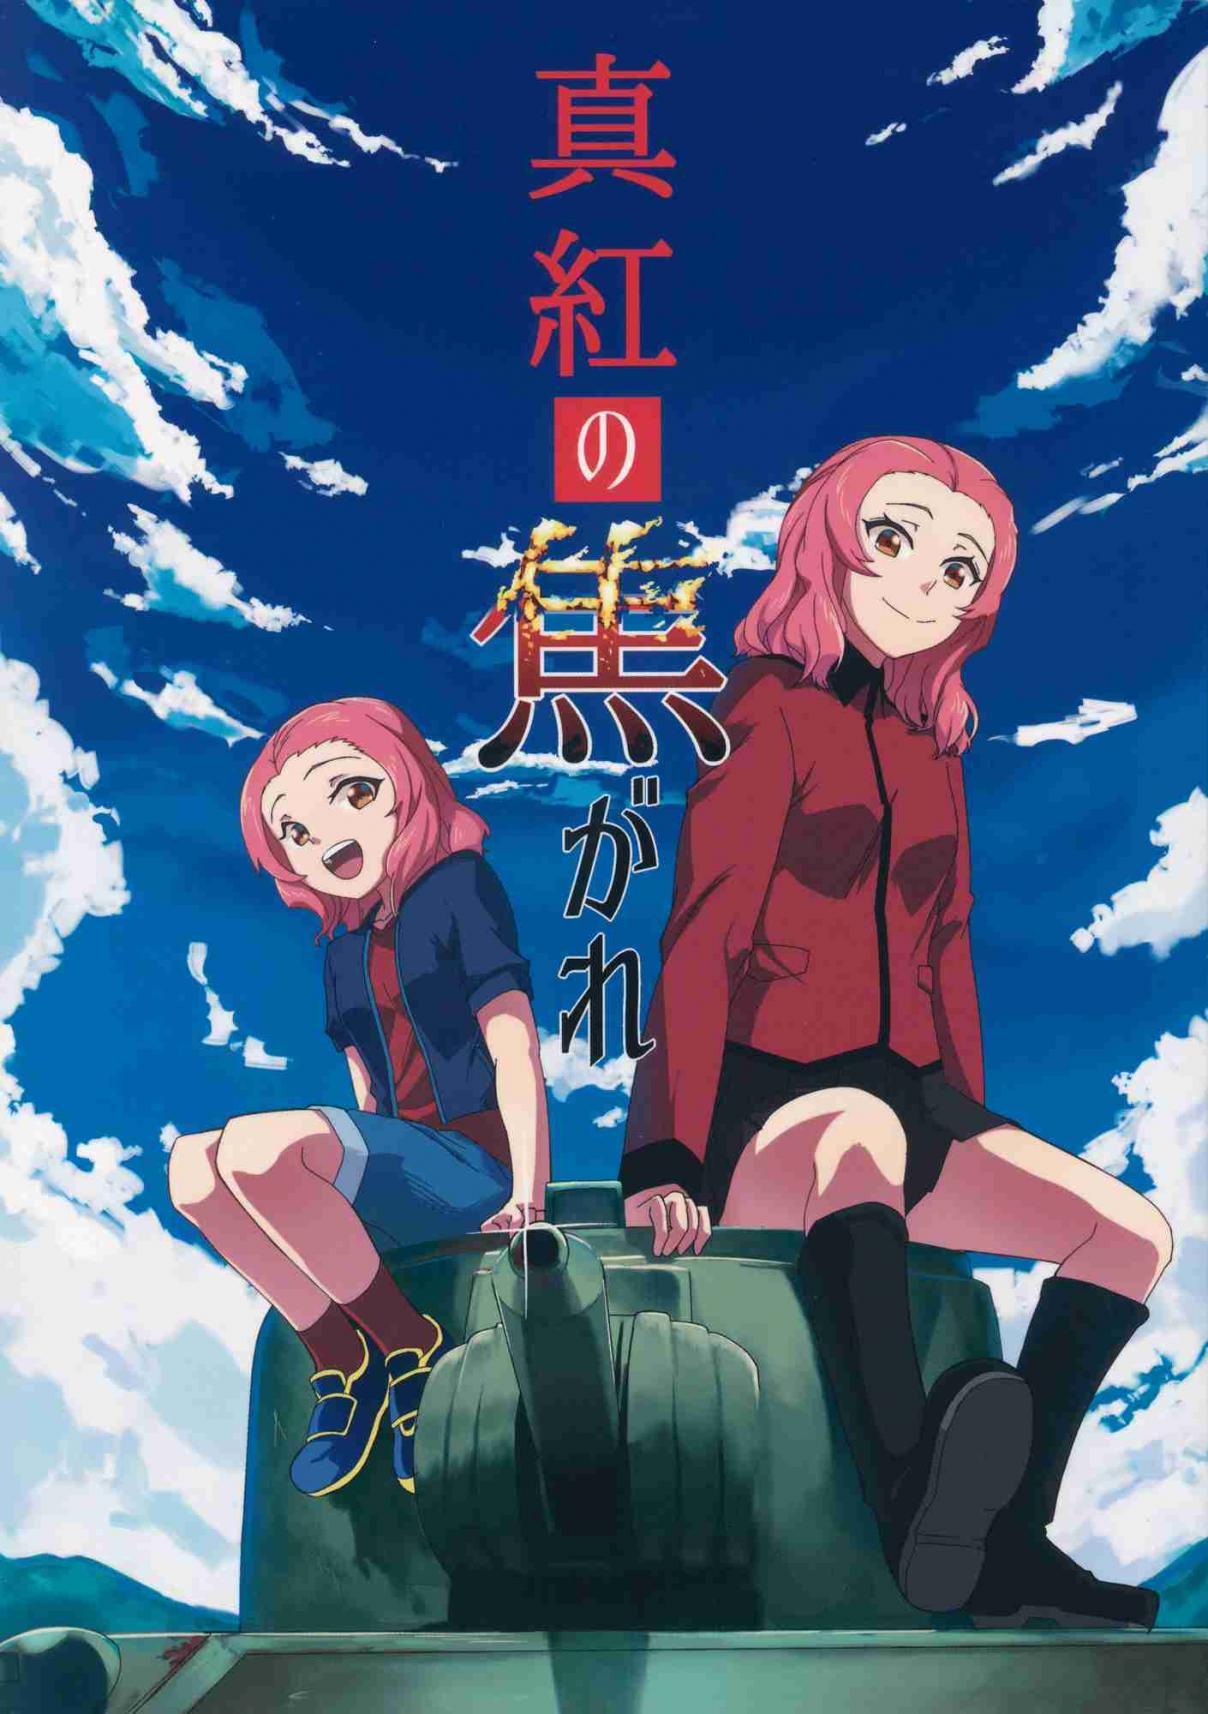 https://manga.mangadogs.com/comics/pic4/0/45568/2650117/07aa55efa914bd335cfcfae098ed58fc.jpg Page 1